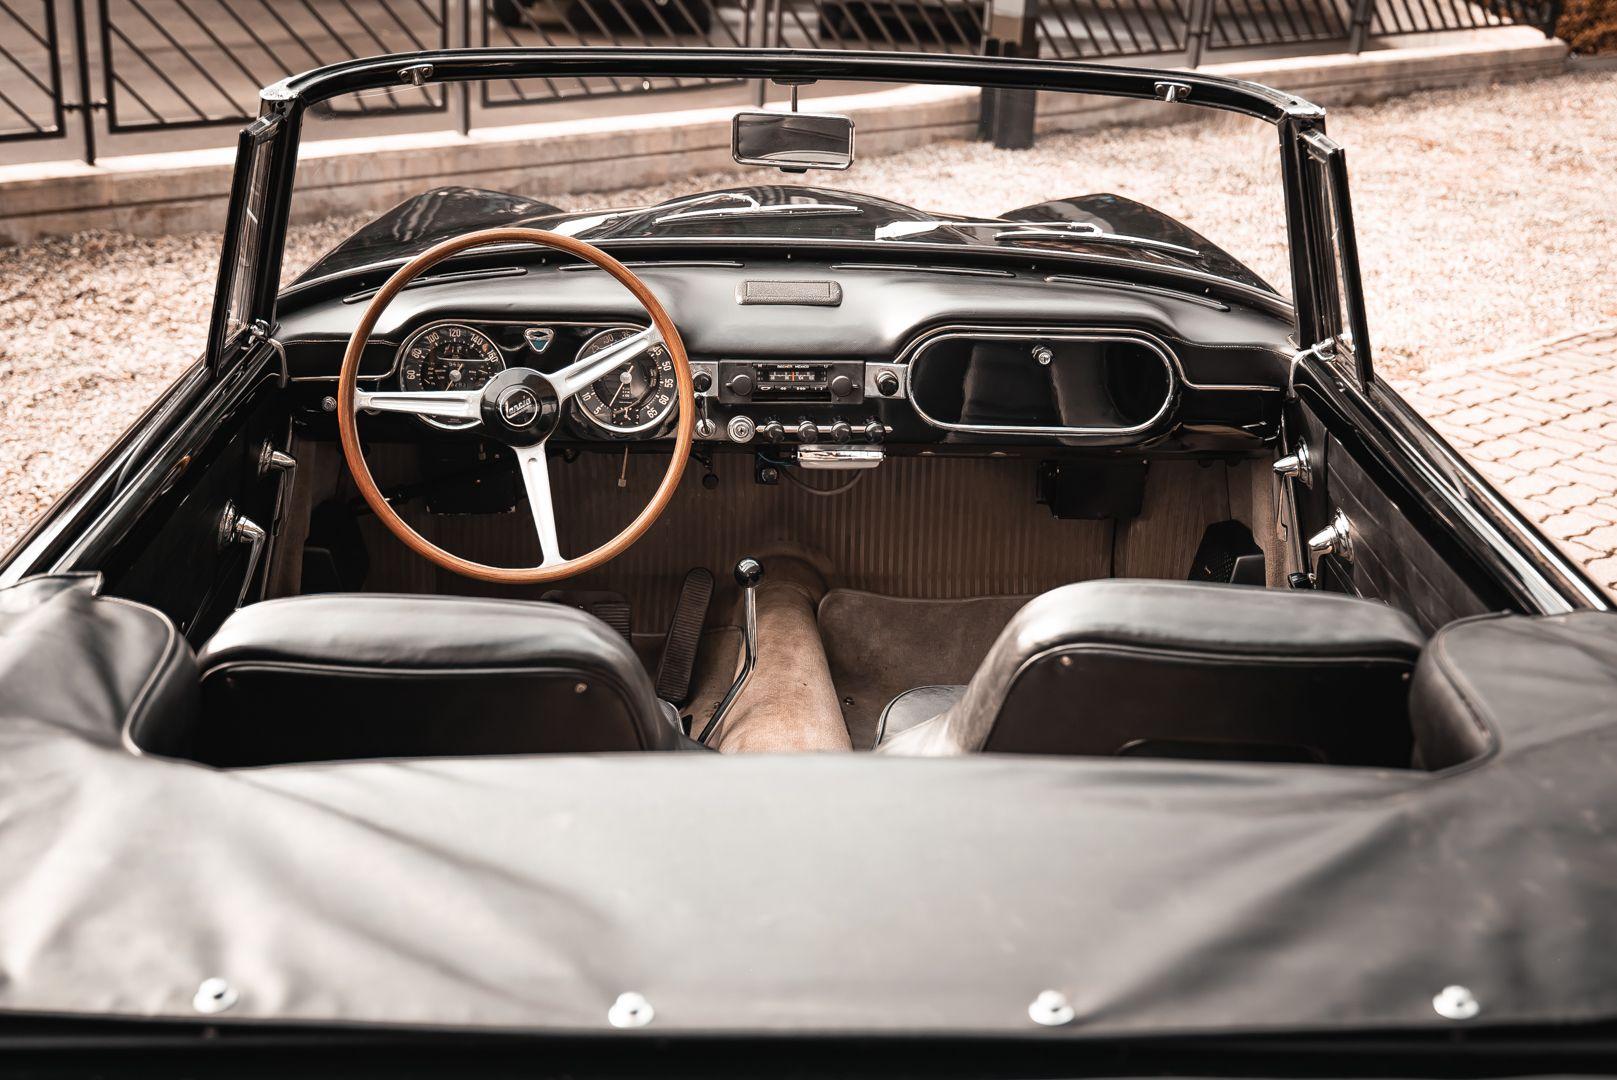 1968 Lancia Flaminia Touring Convertible 2800 3C 79138